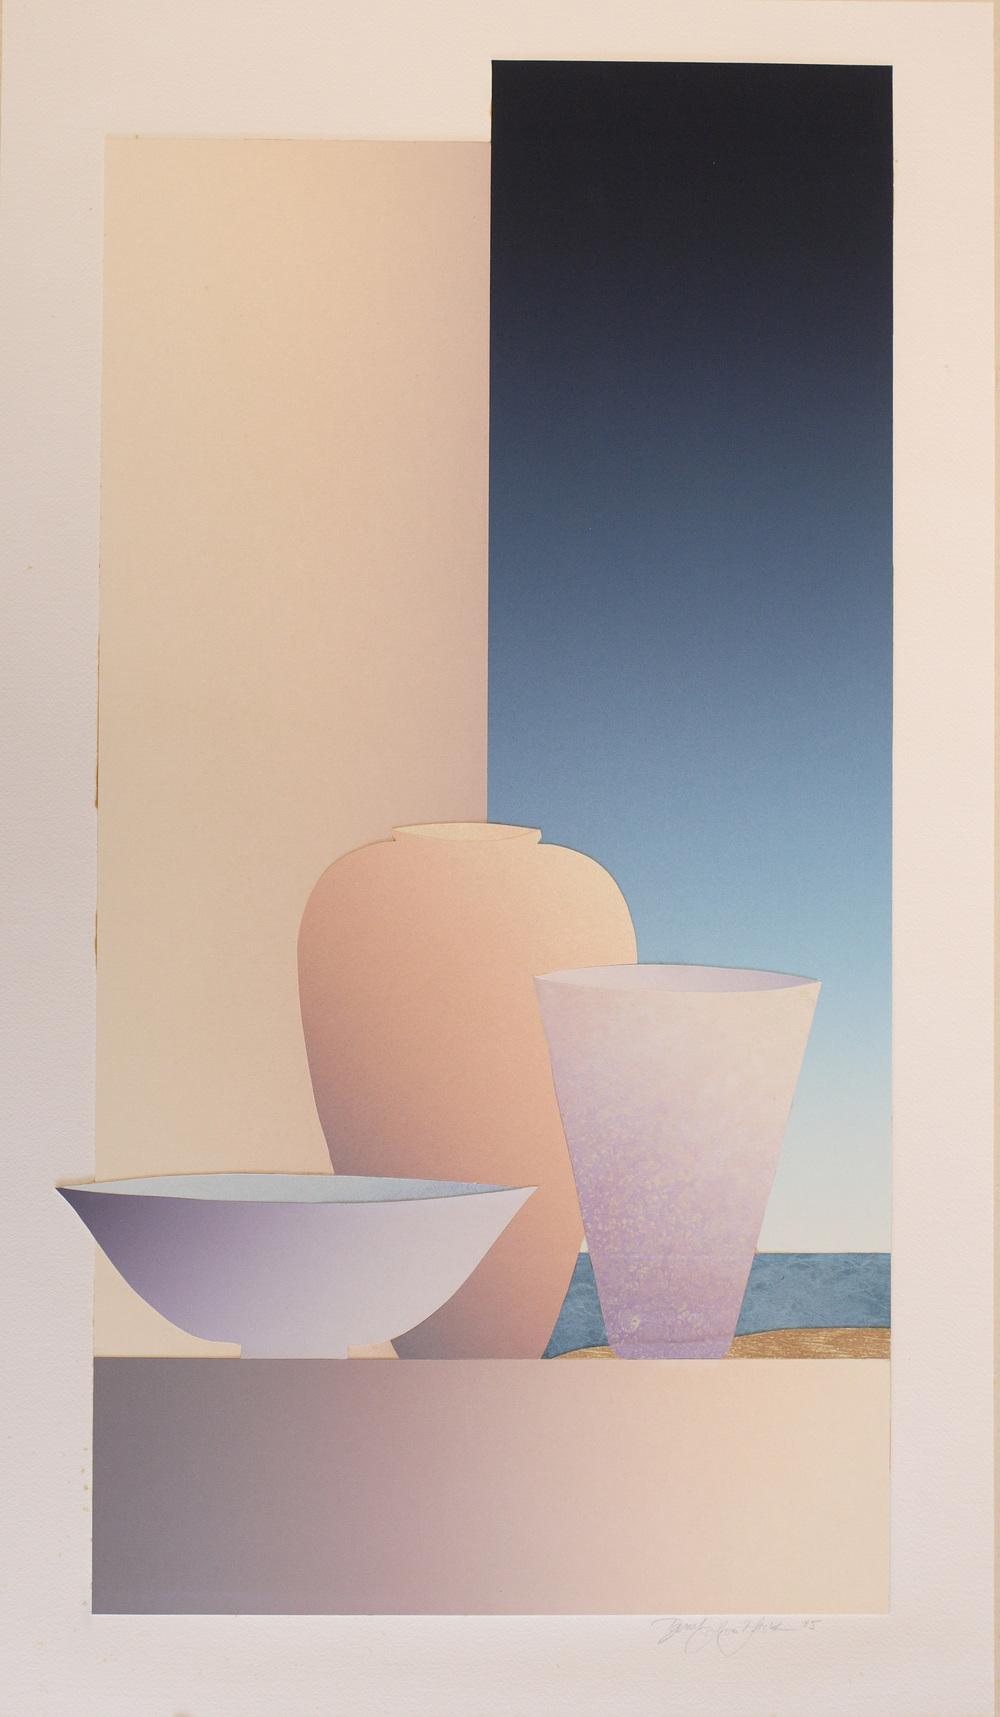 Vases-480-24X14.jpg